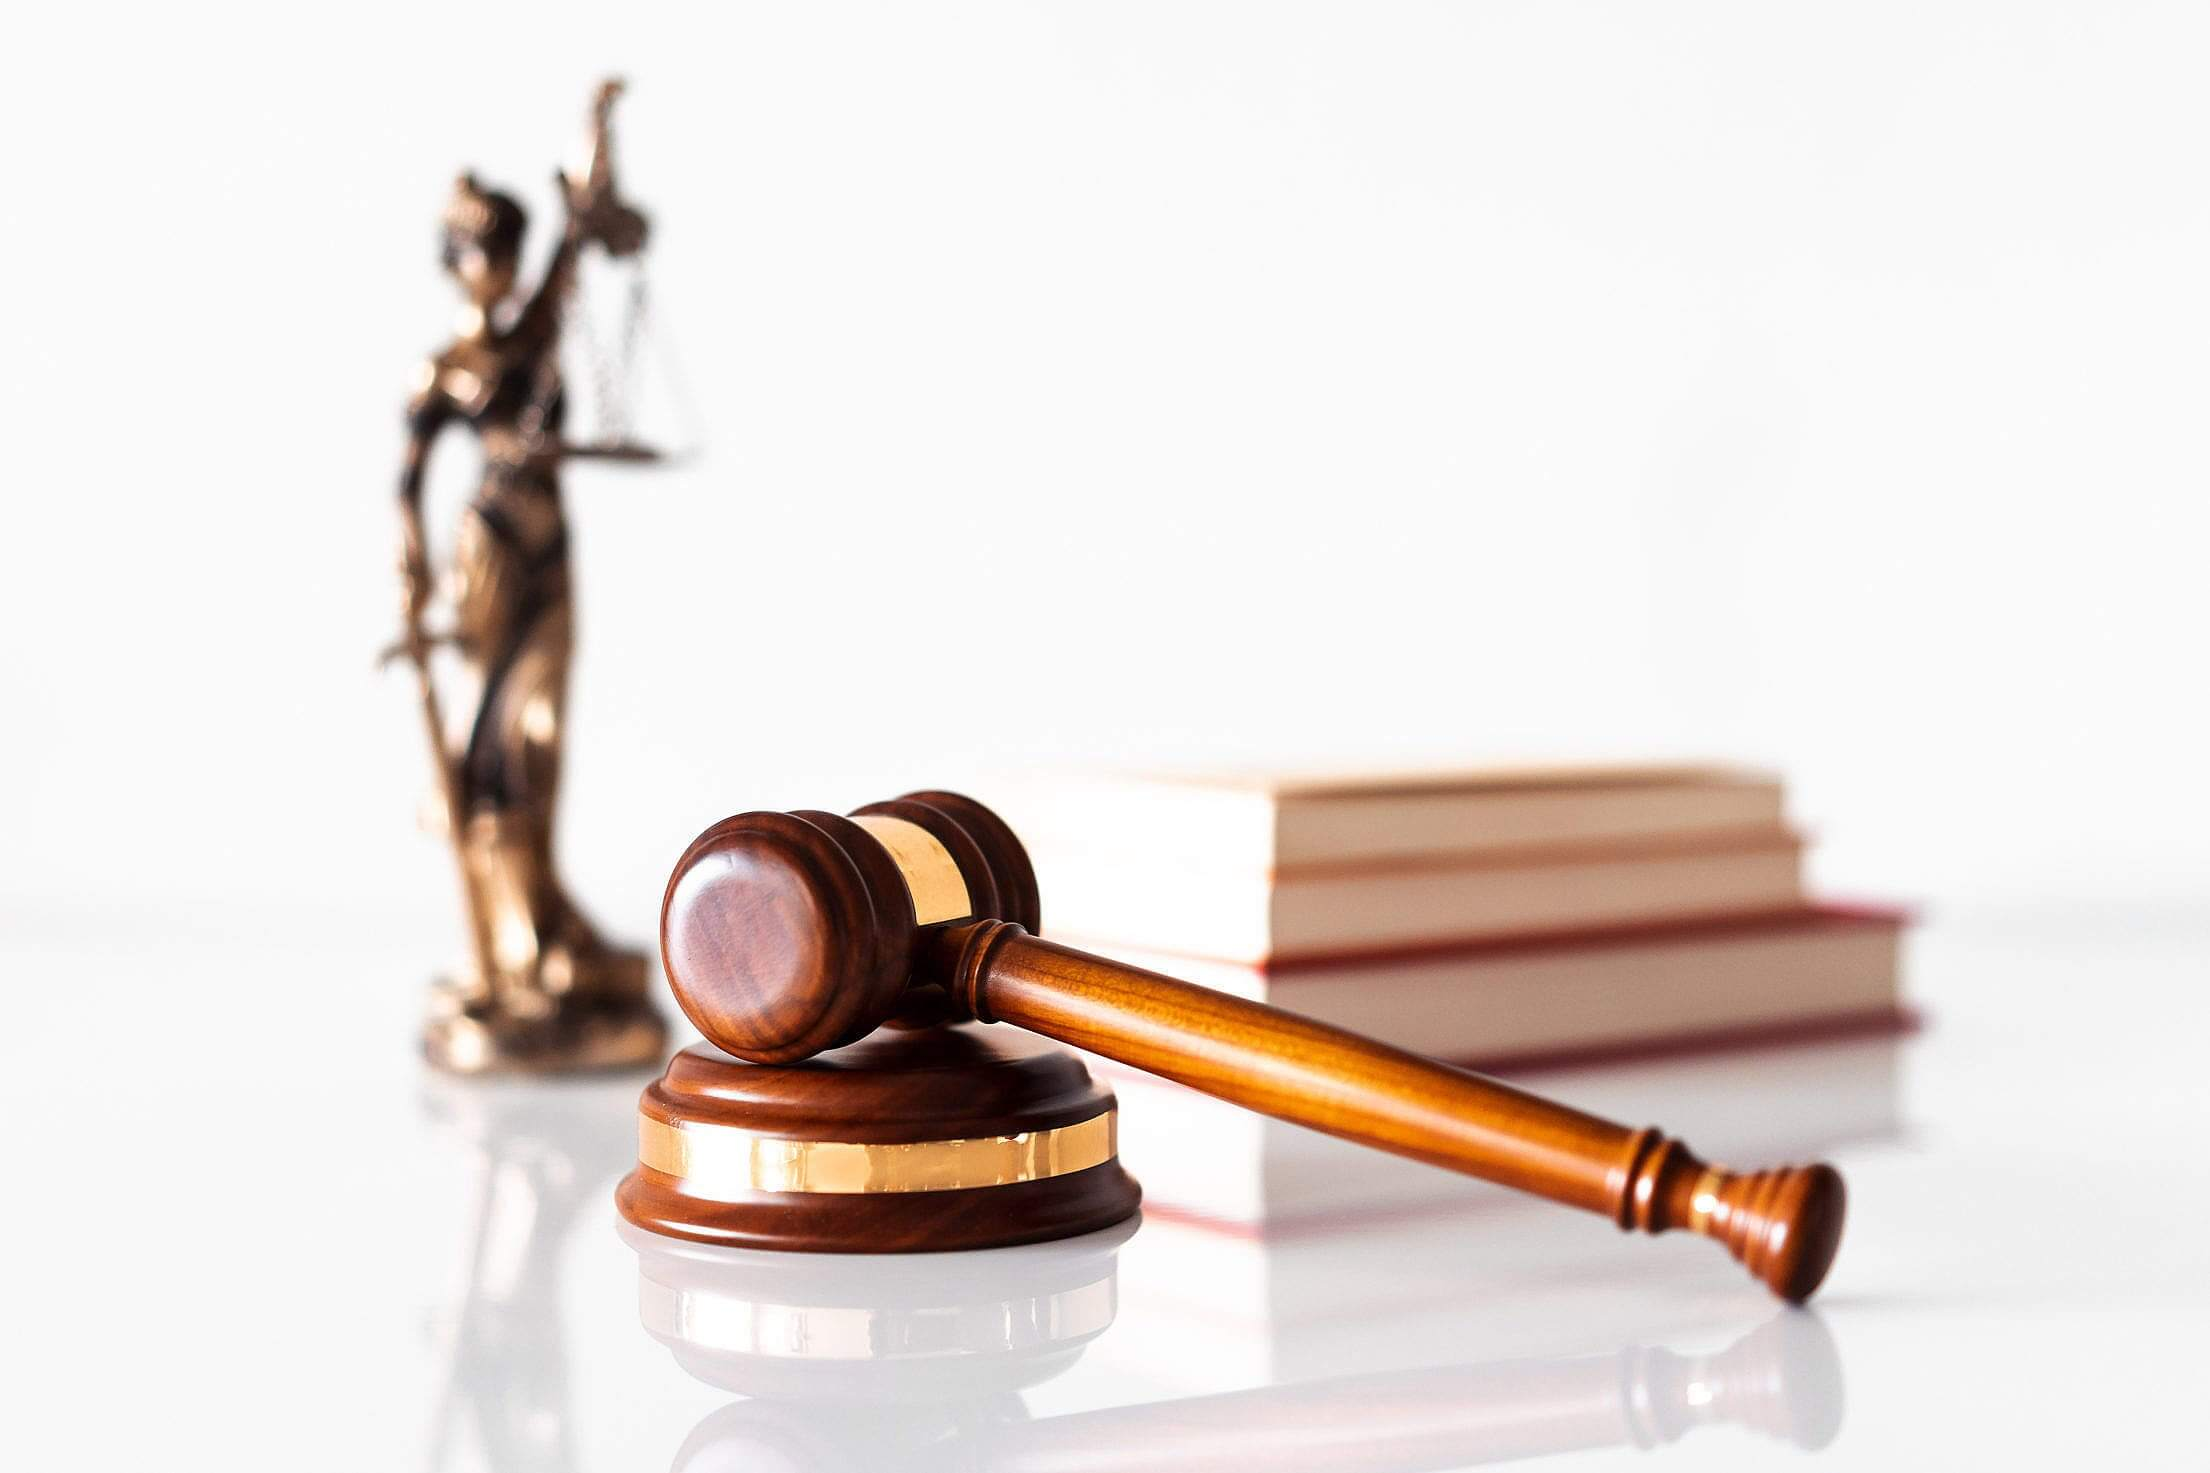 icra avukatı bulma